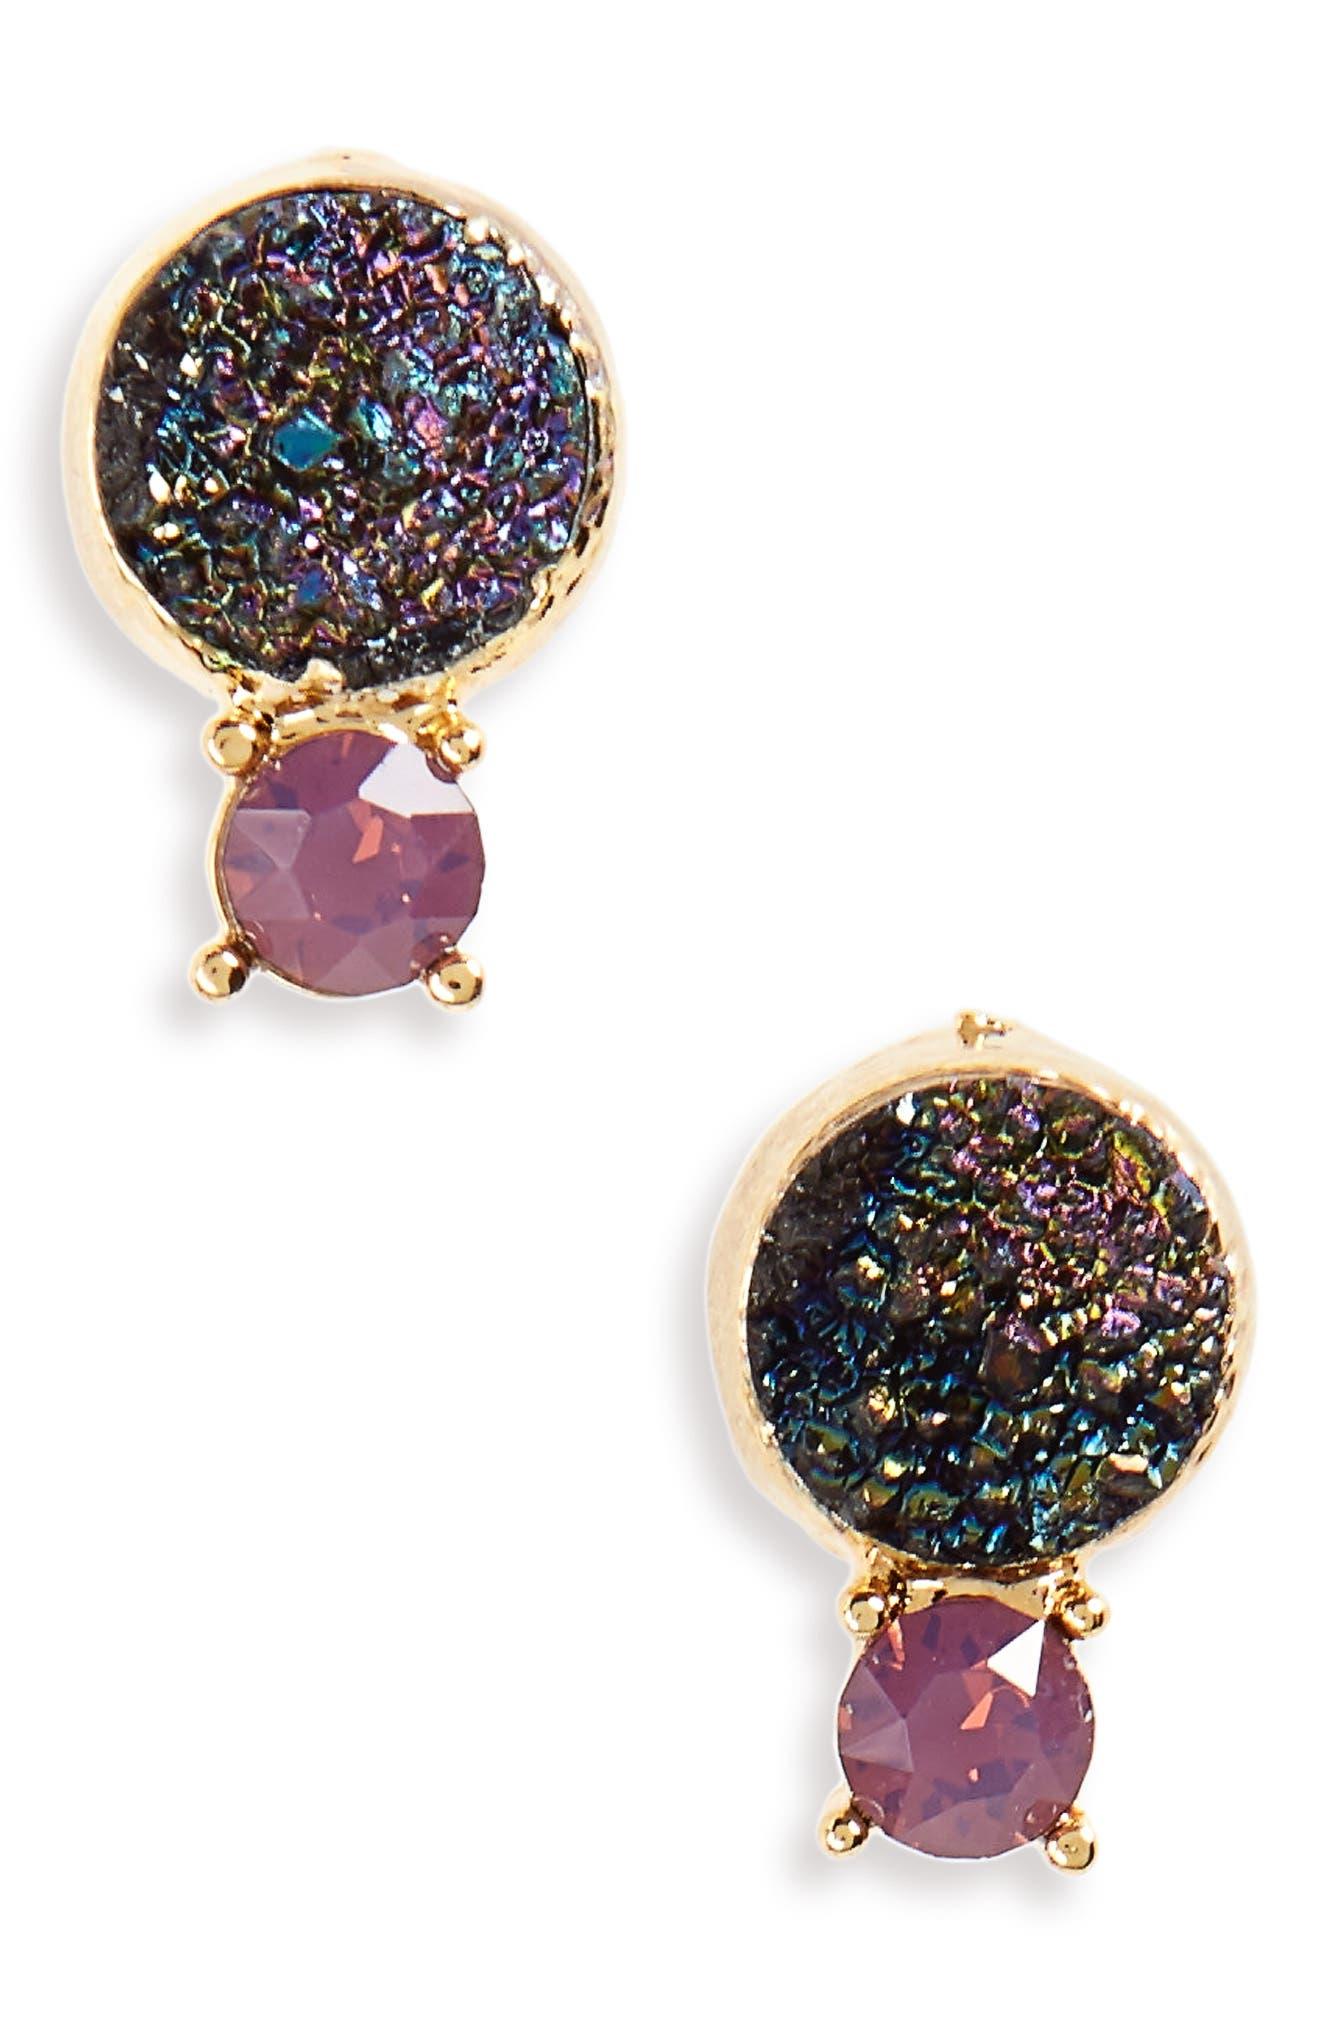 Crystal & Faux Drusy Stud Earrings,                             Main thumbnail 1, color,                             Multi